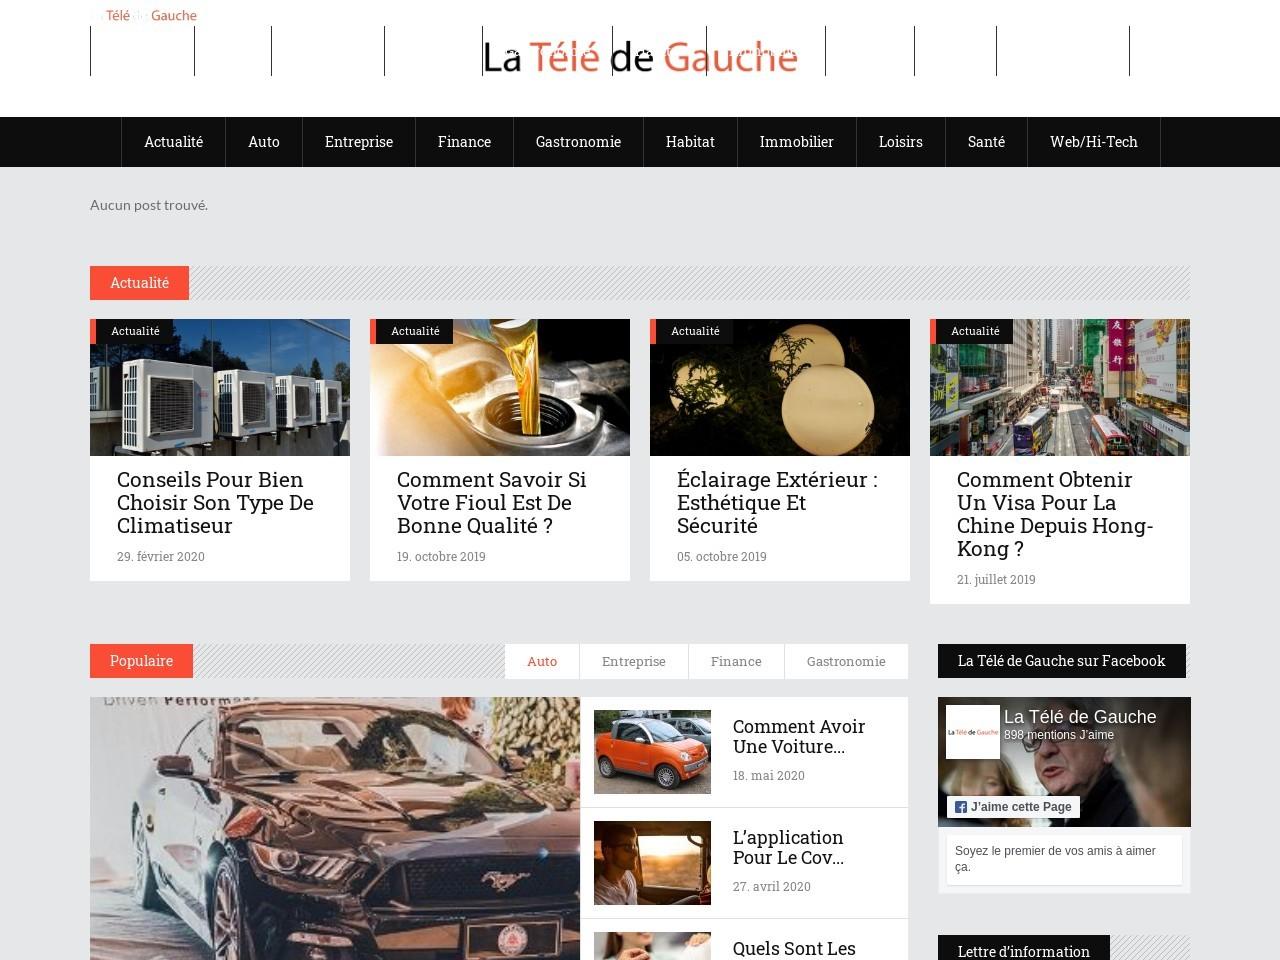 lateledegauche.fr